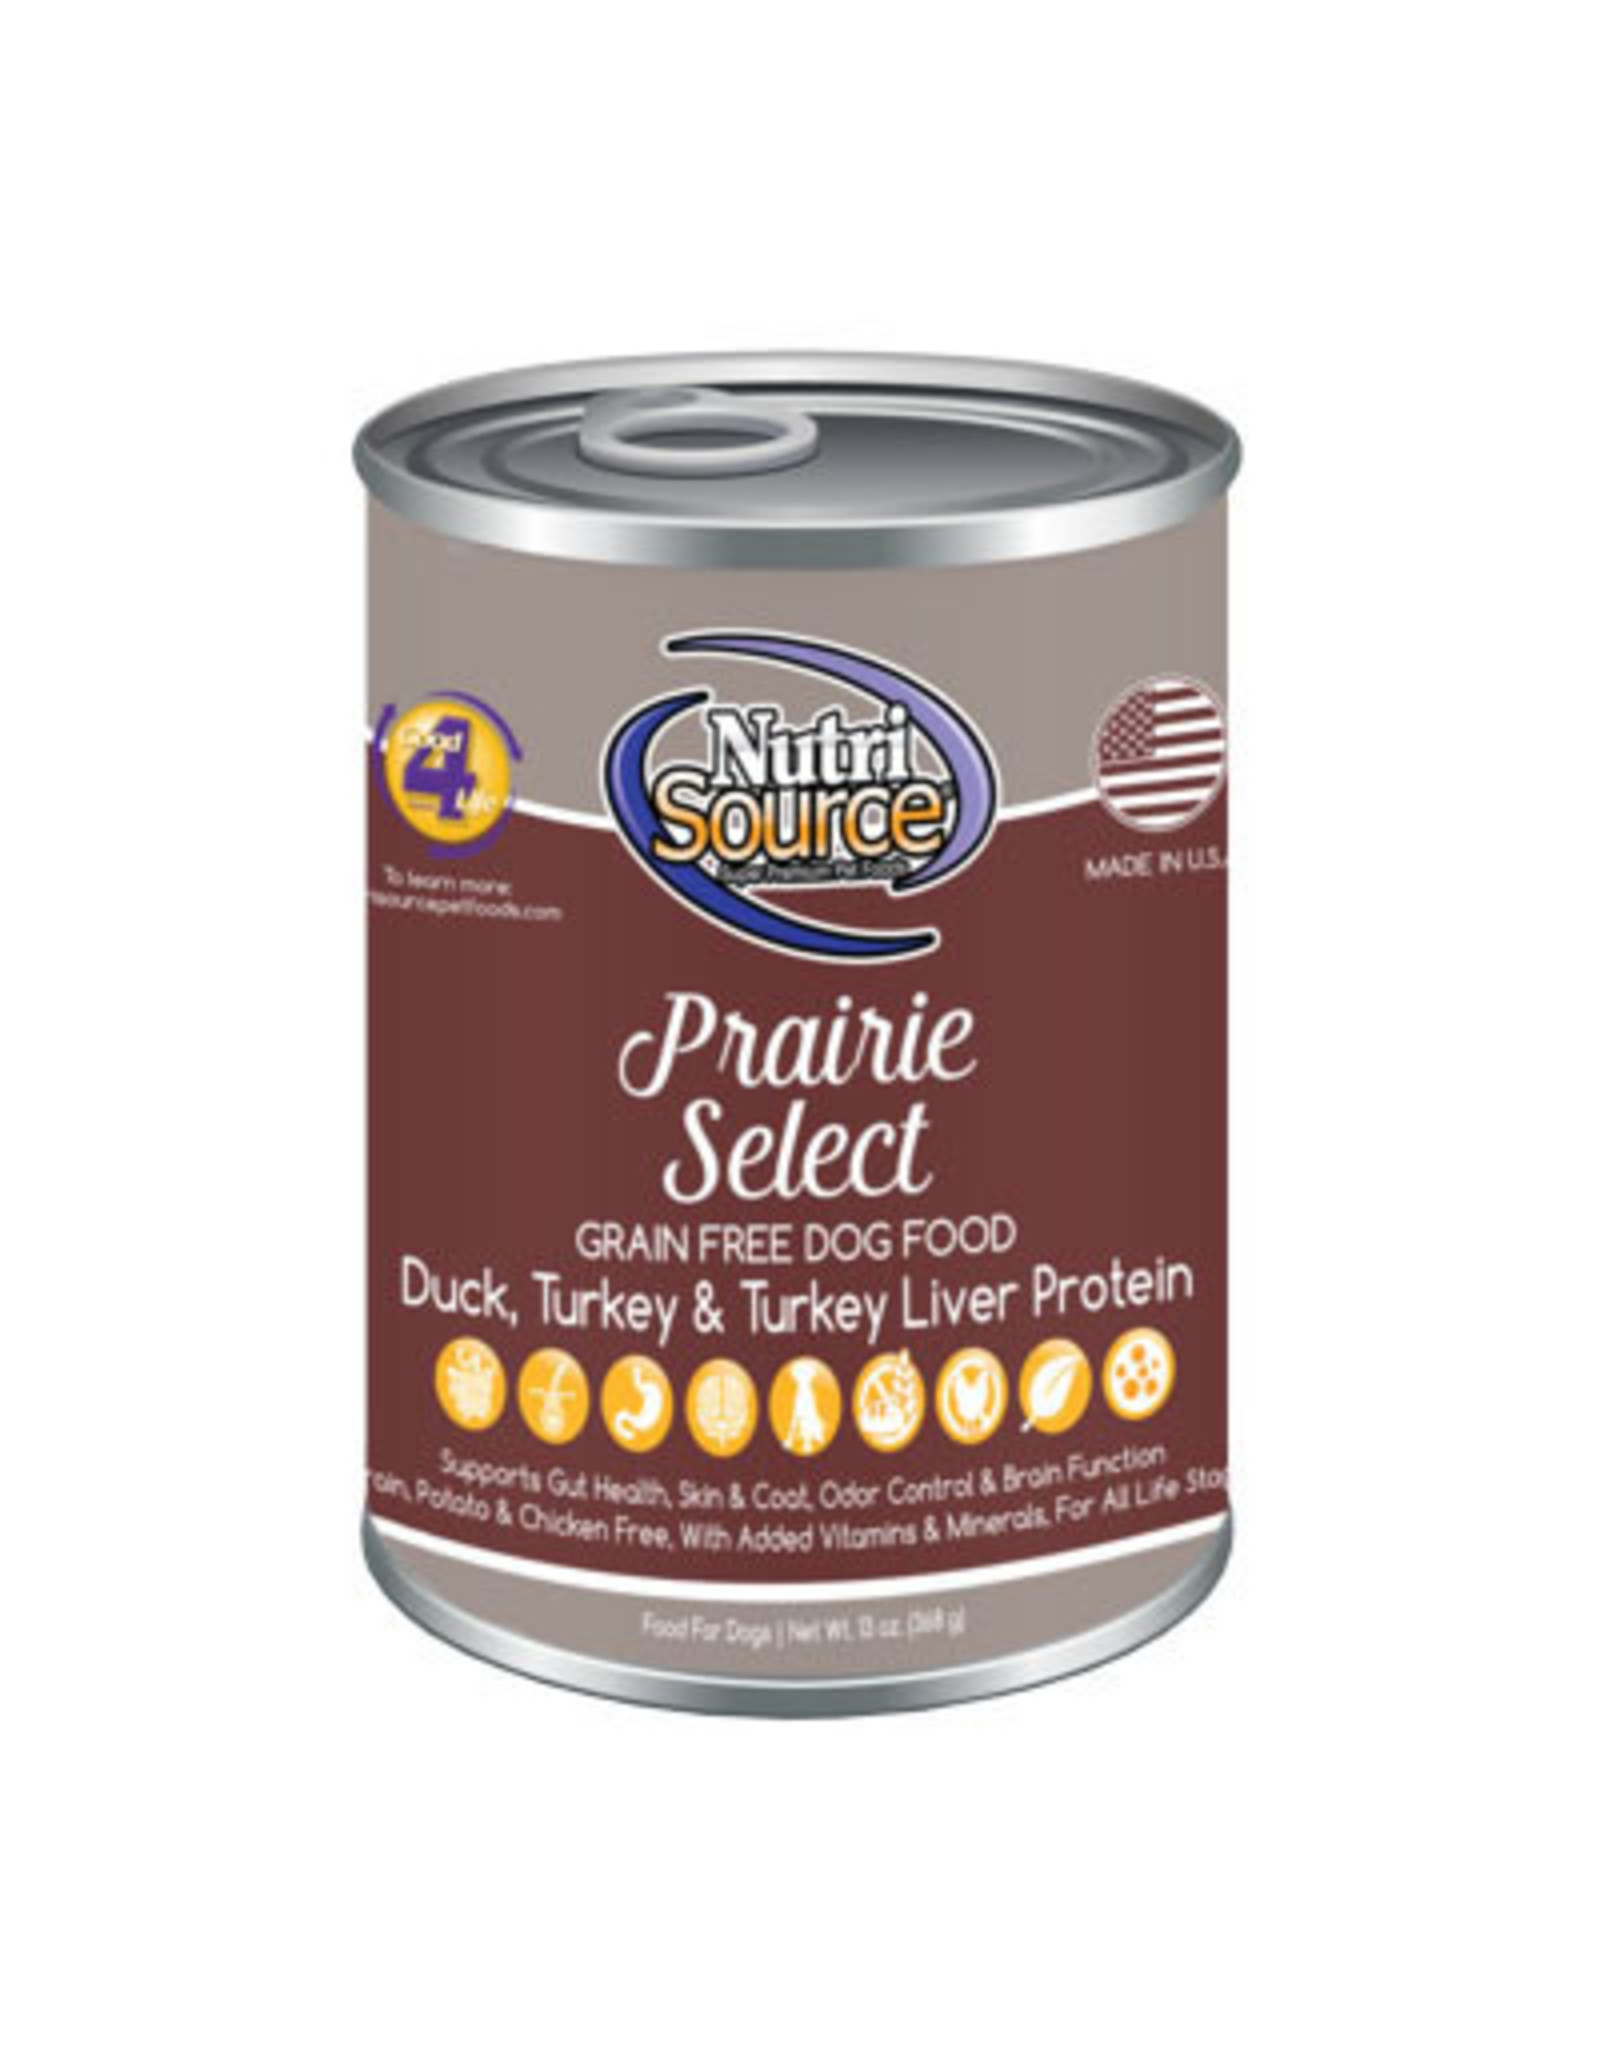 NutriSource Pet Foods NUTRISOURCE DOG PRAIRIE SELECT 13OZ